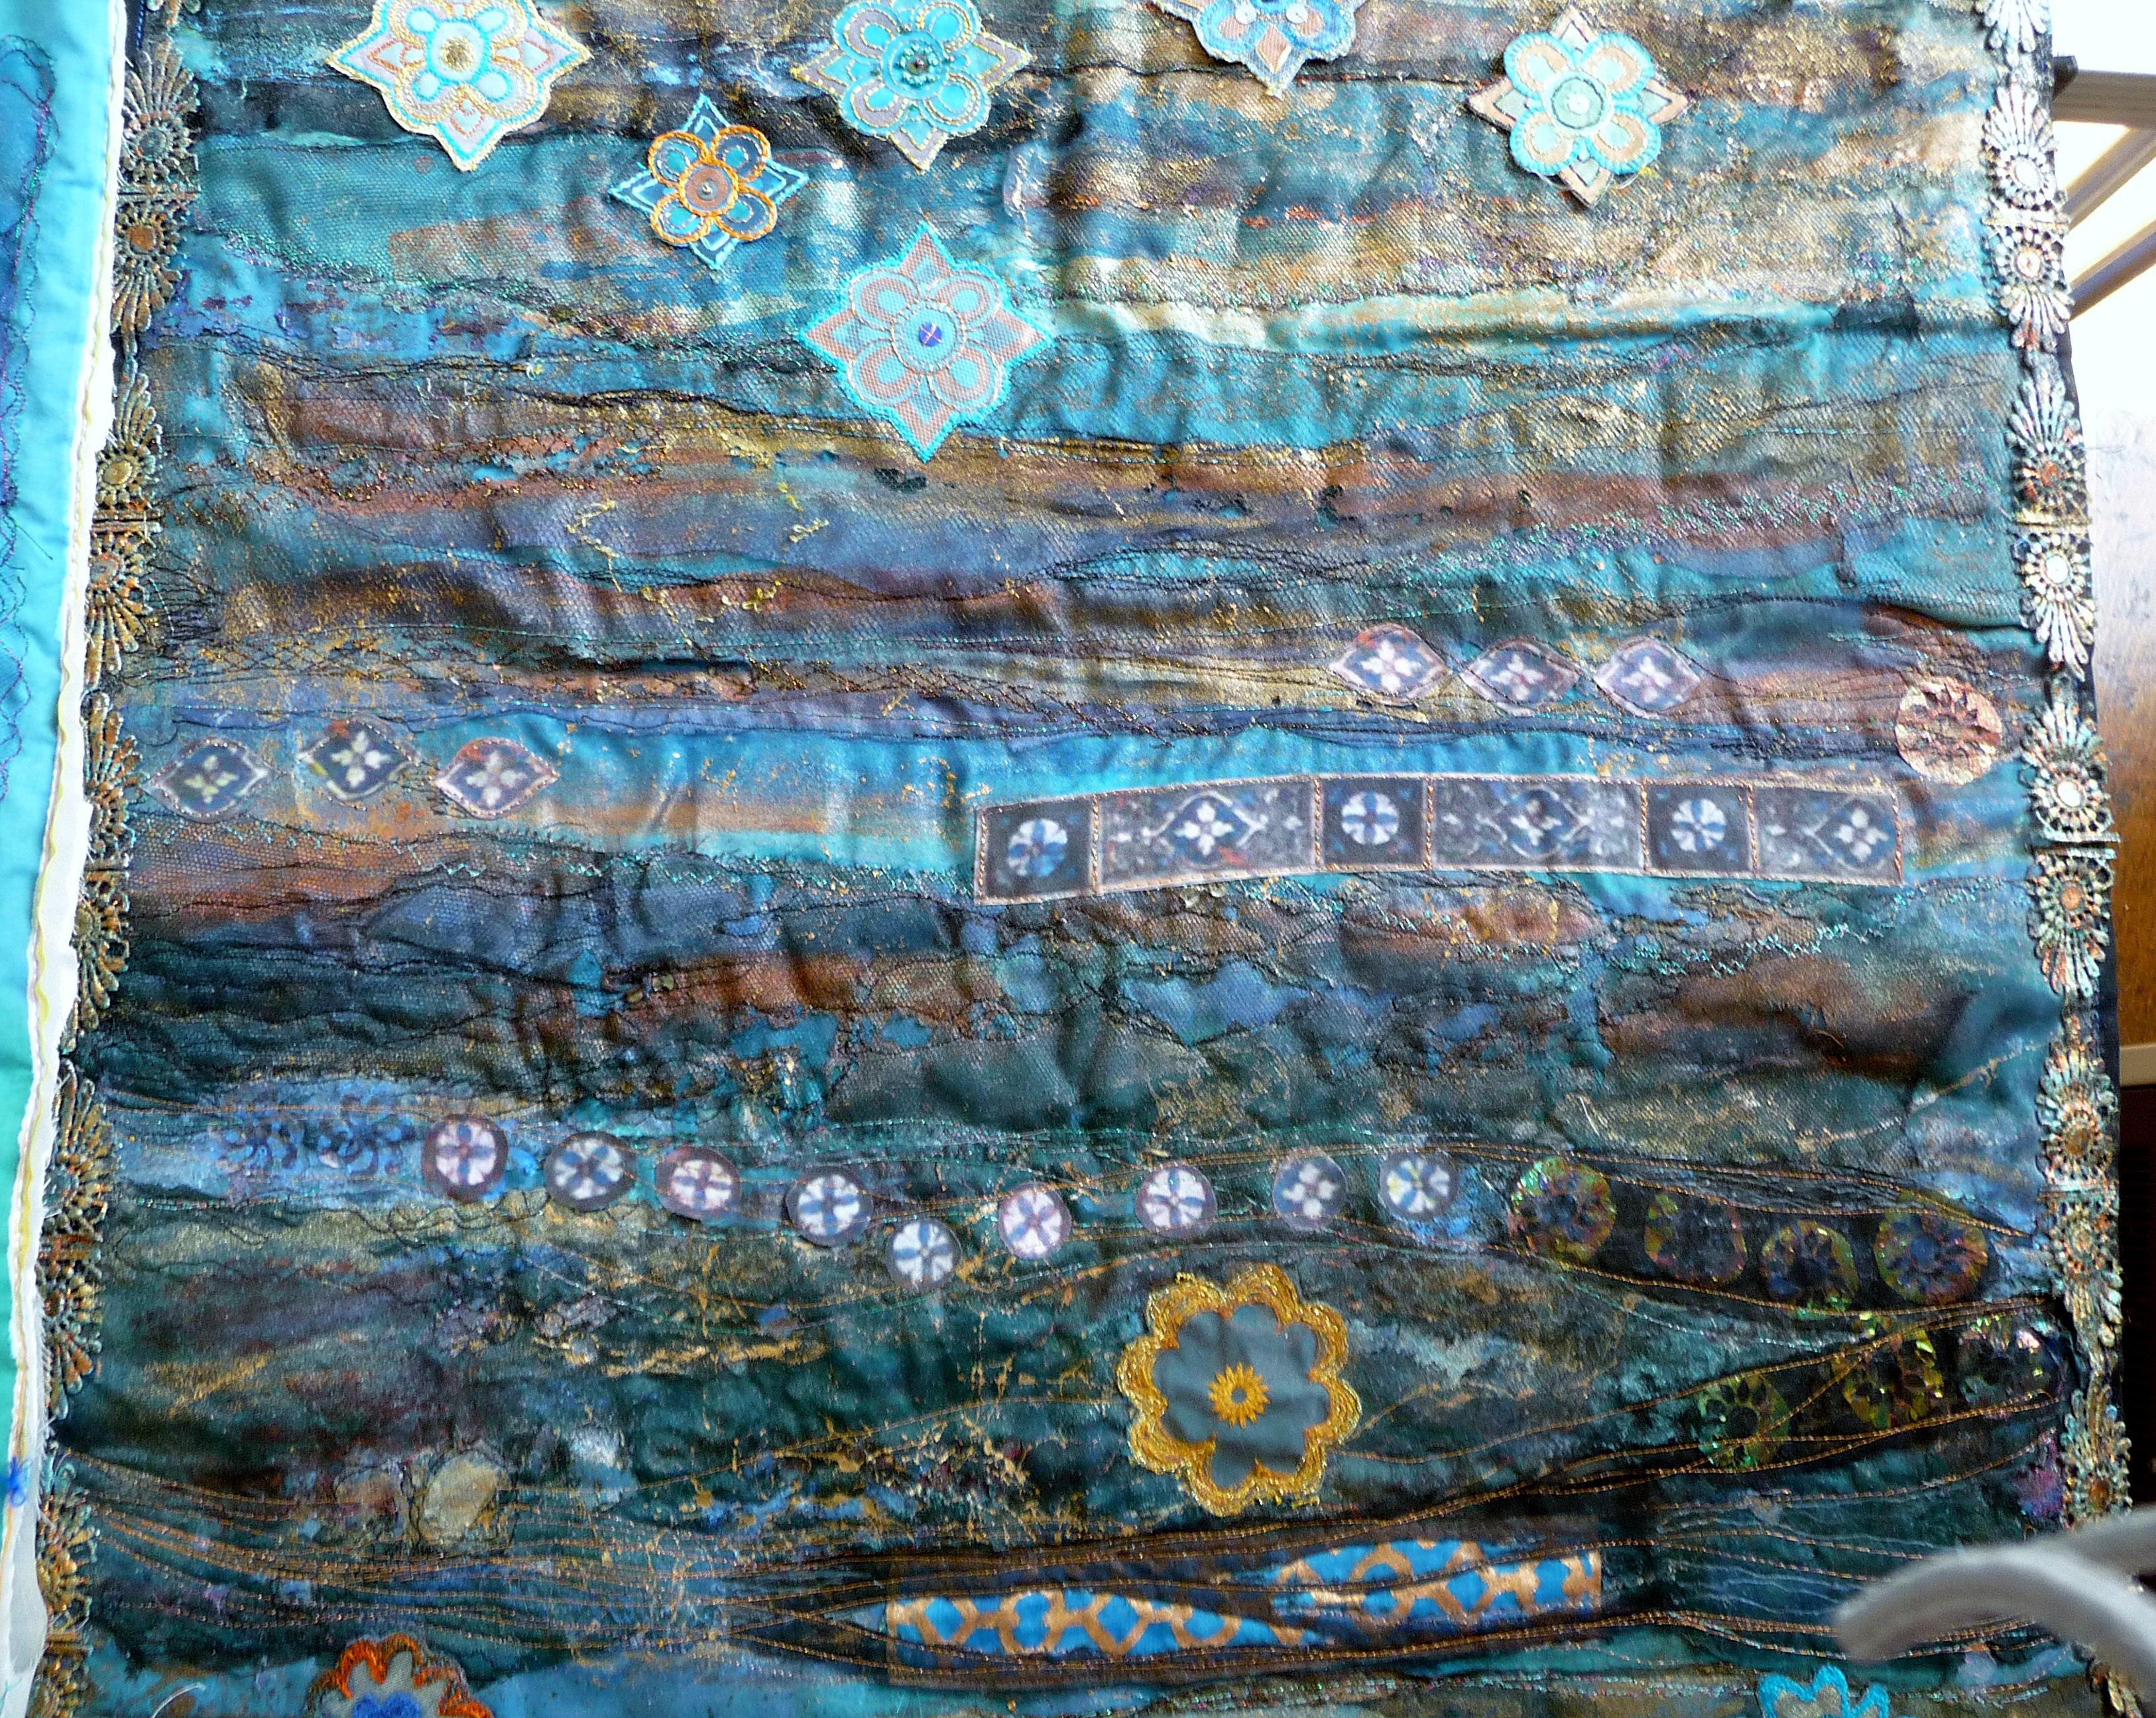 embroidery by Beryl Waterfield, Altrincham EG